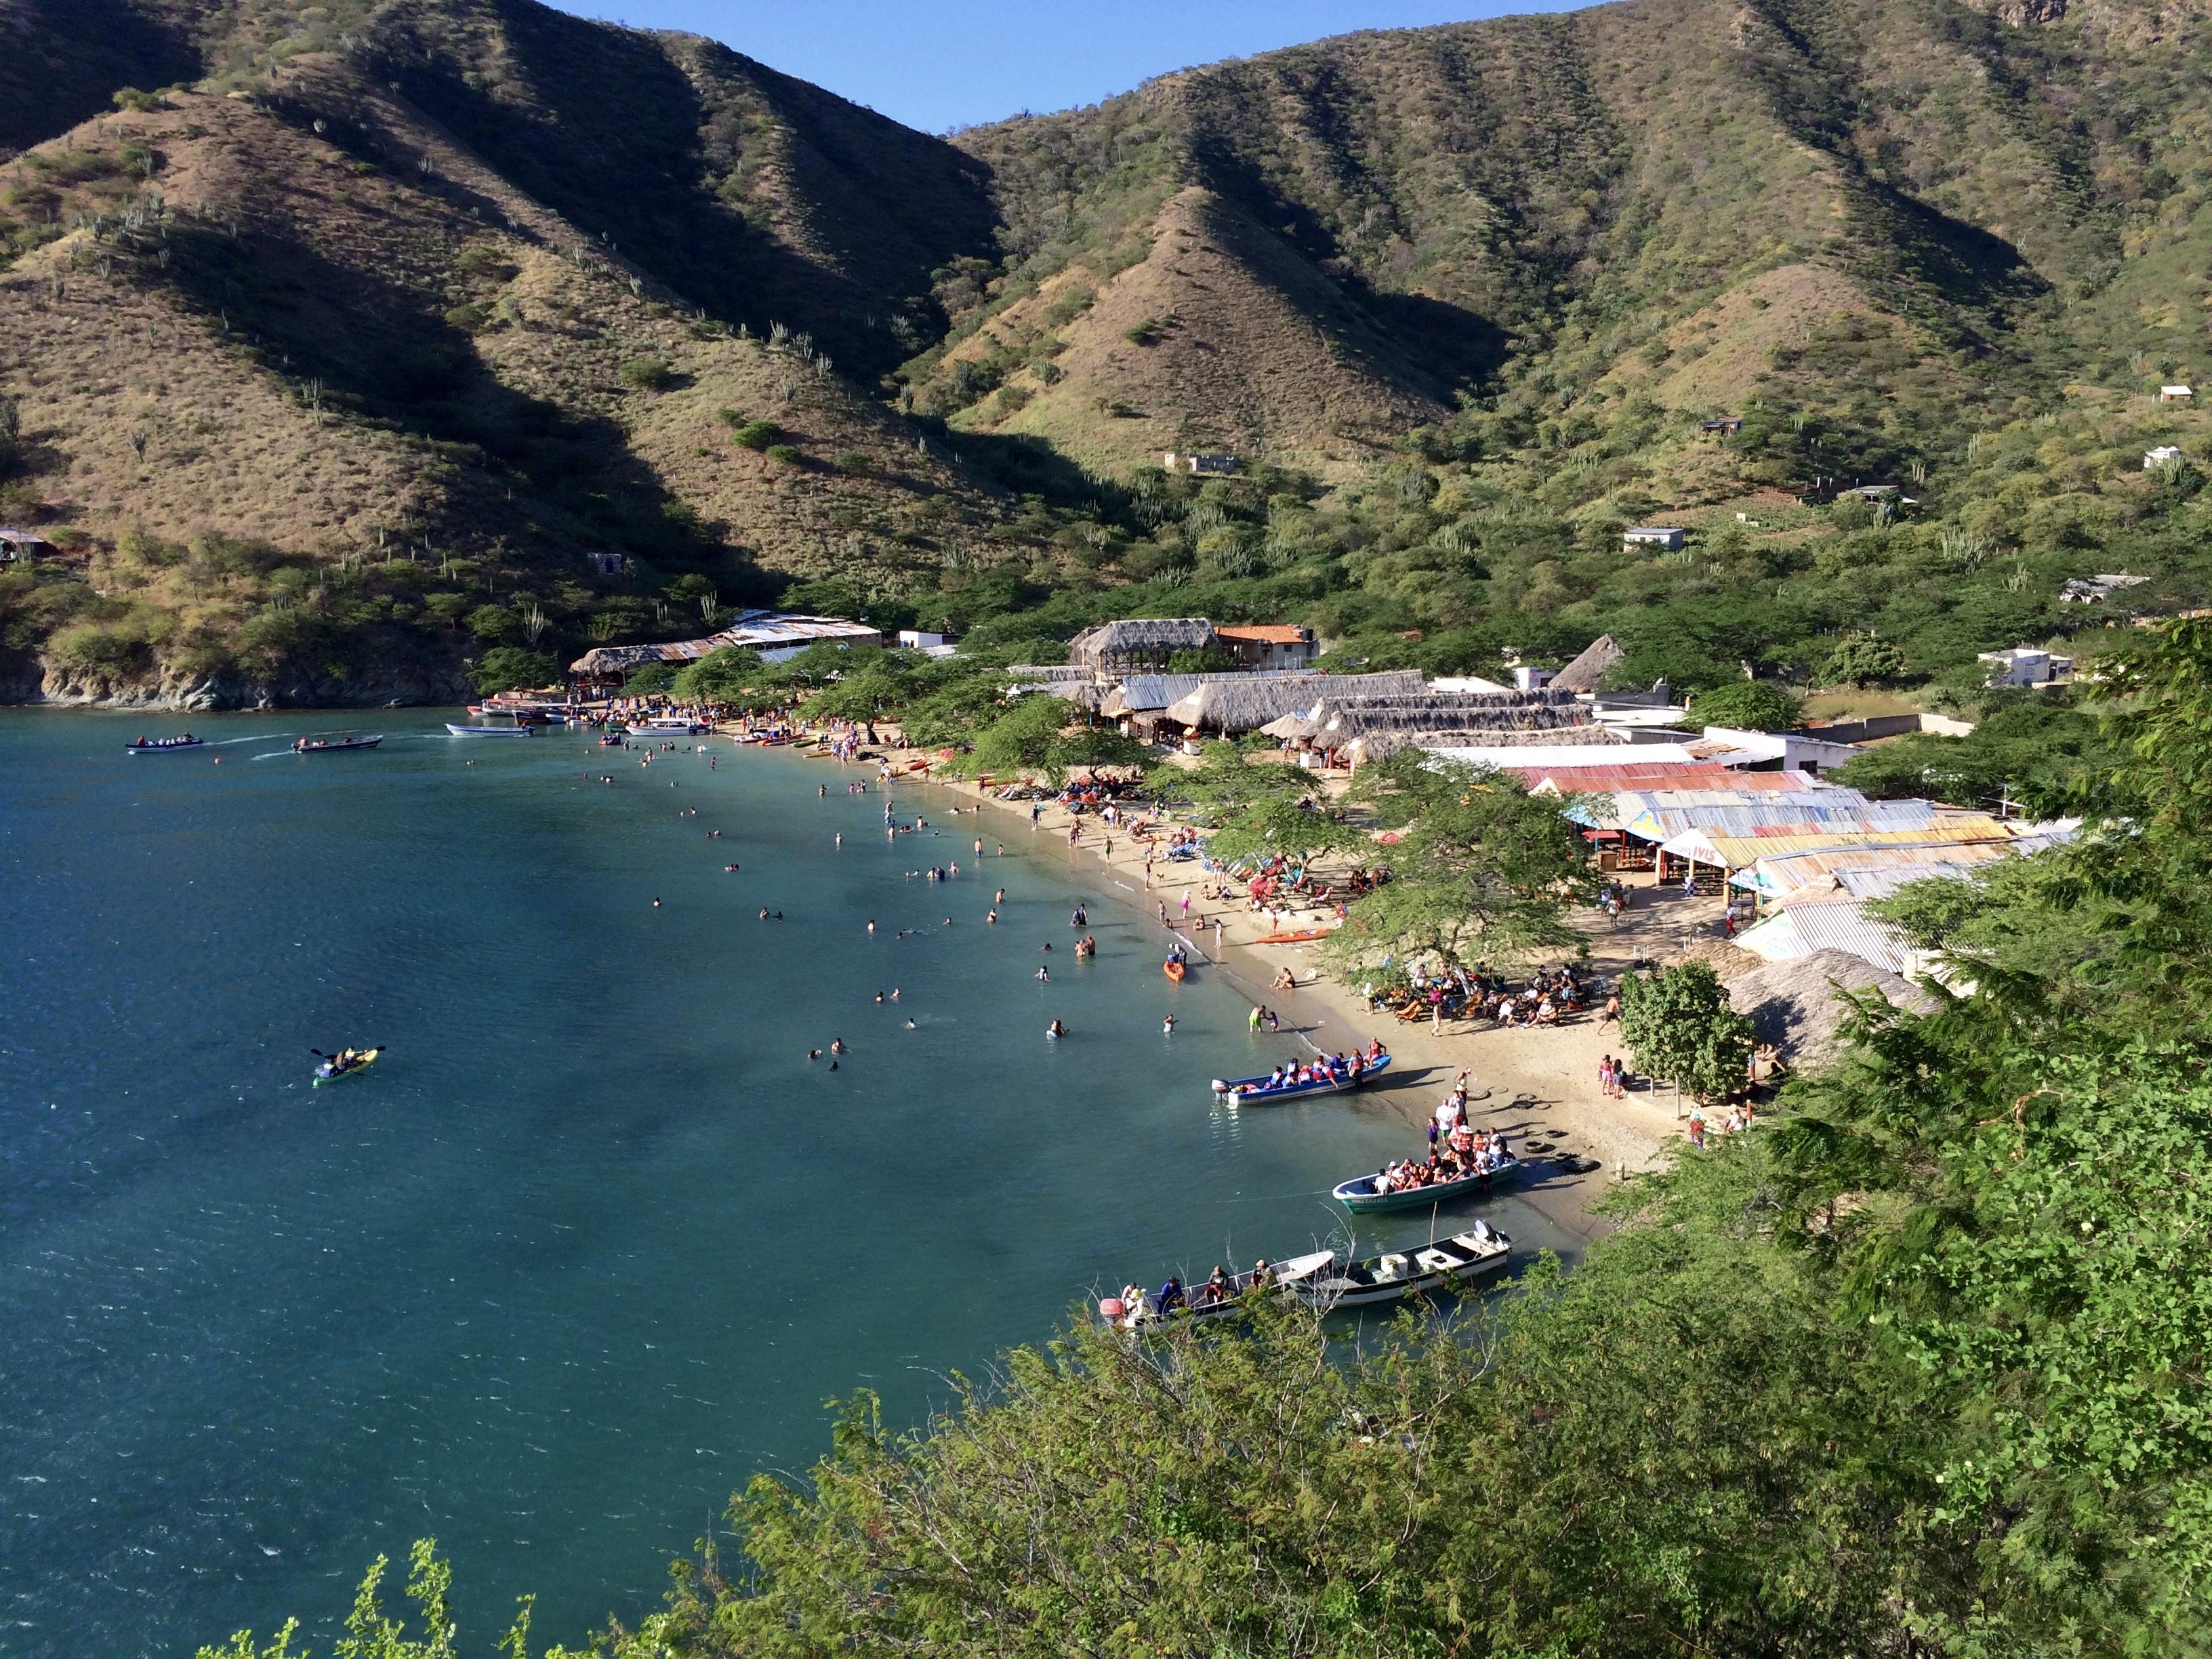 Playa blanca, Santa Marta